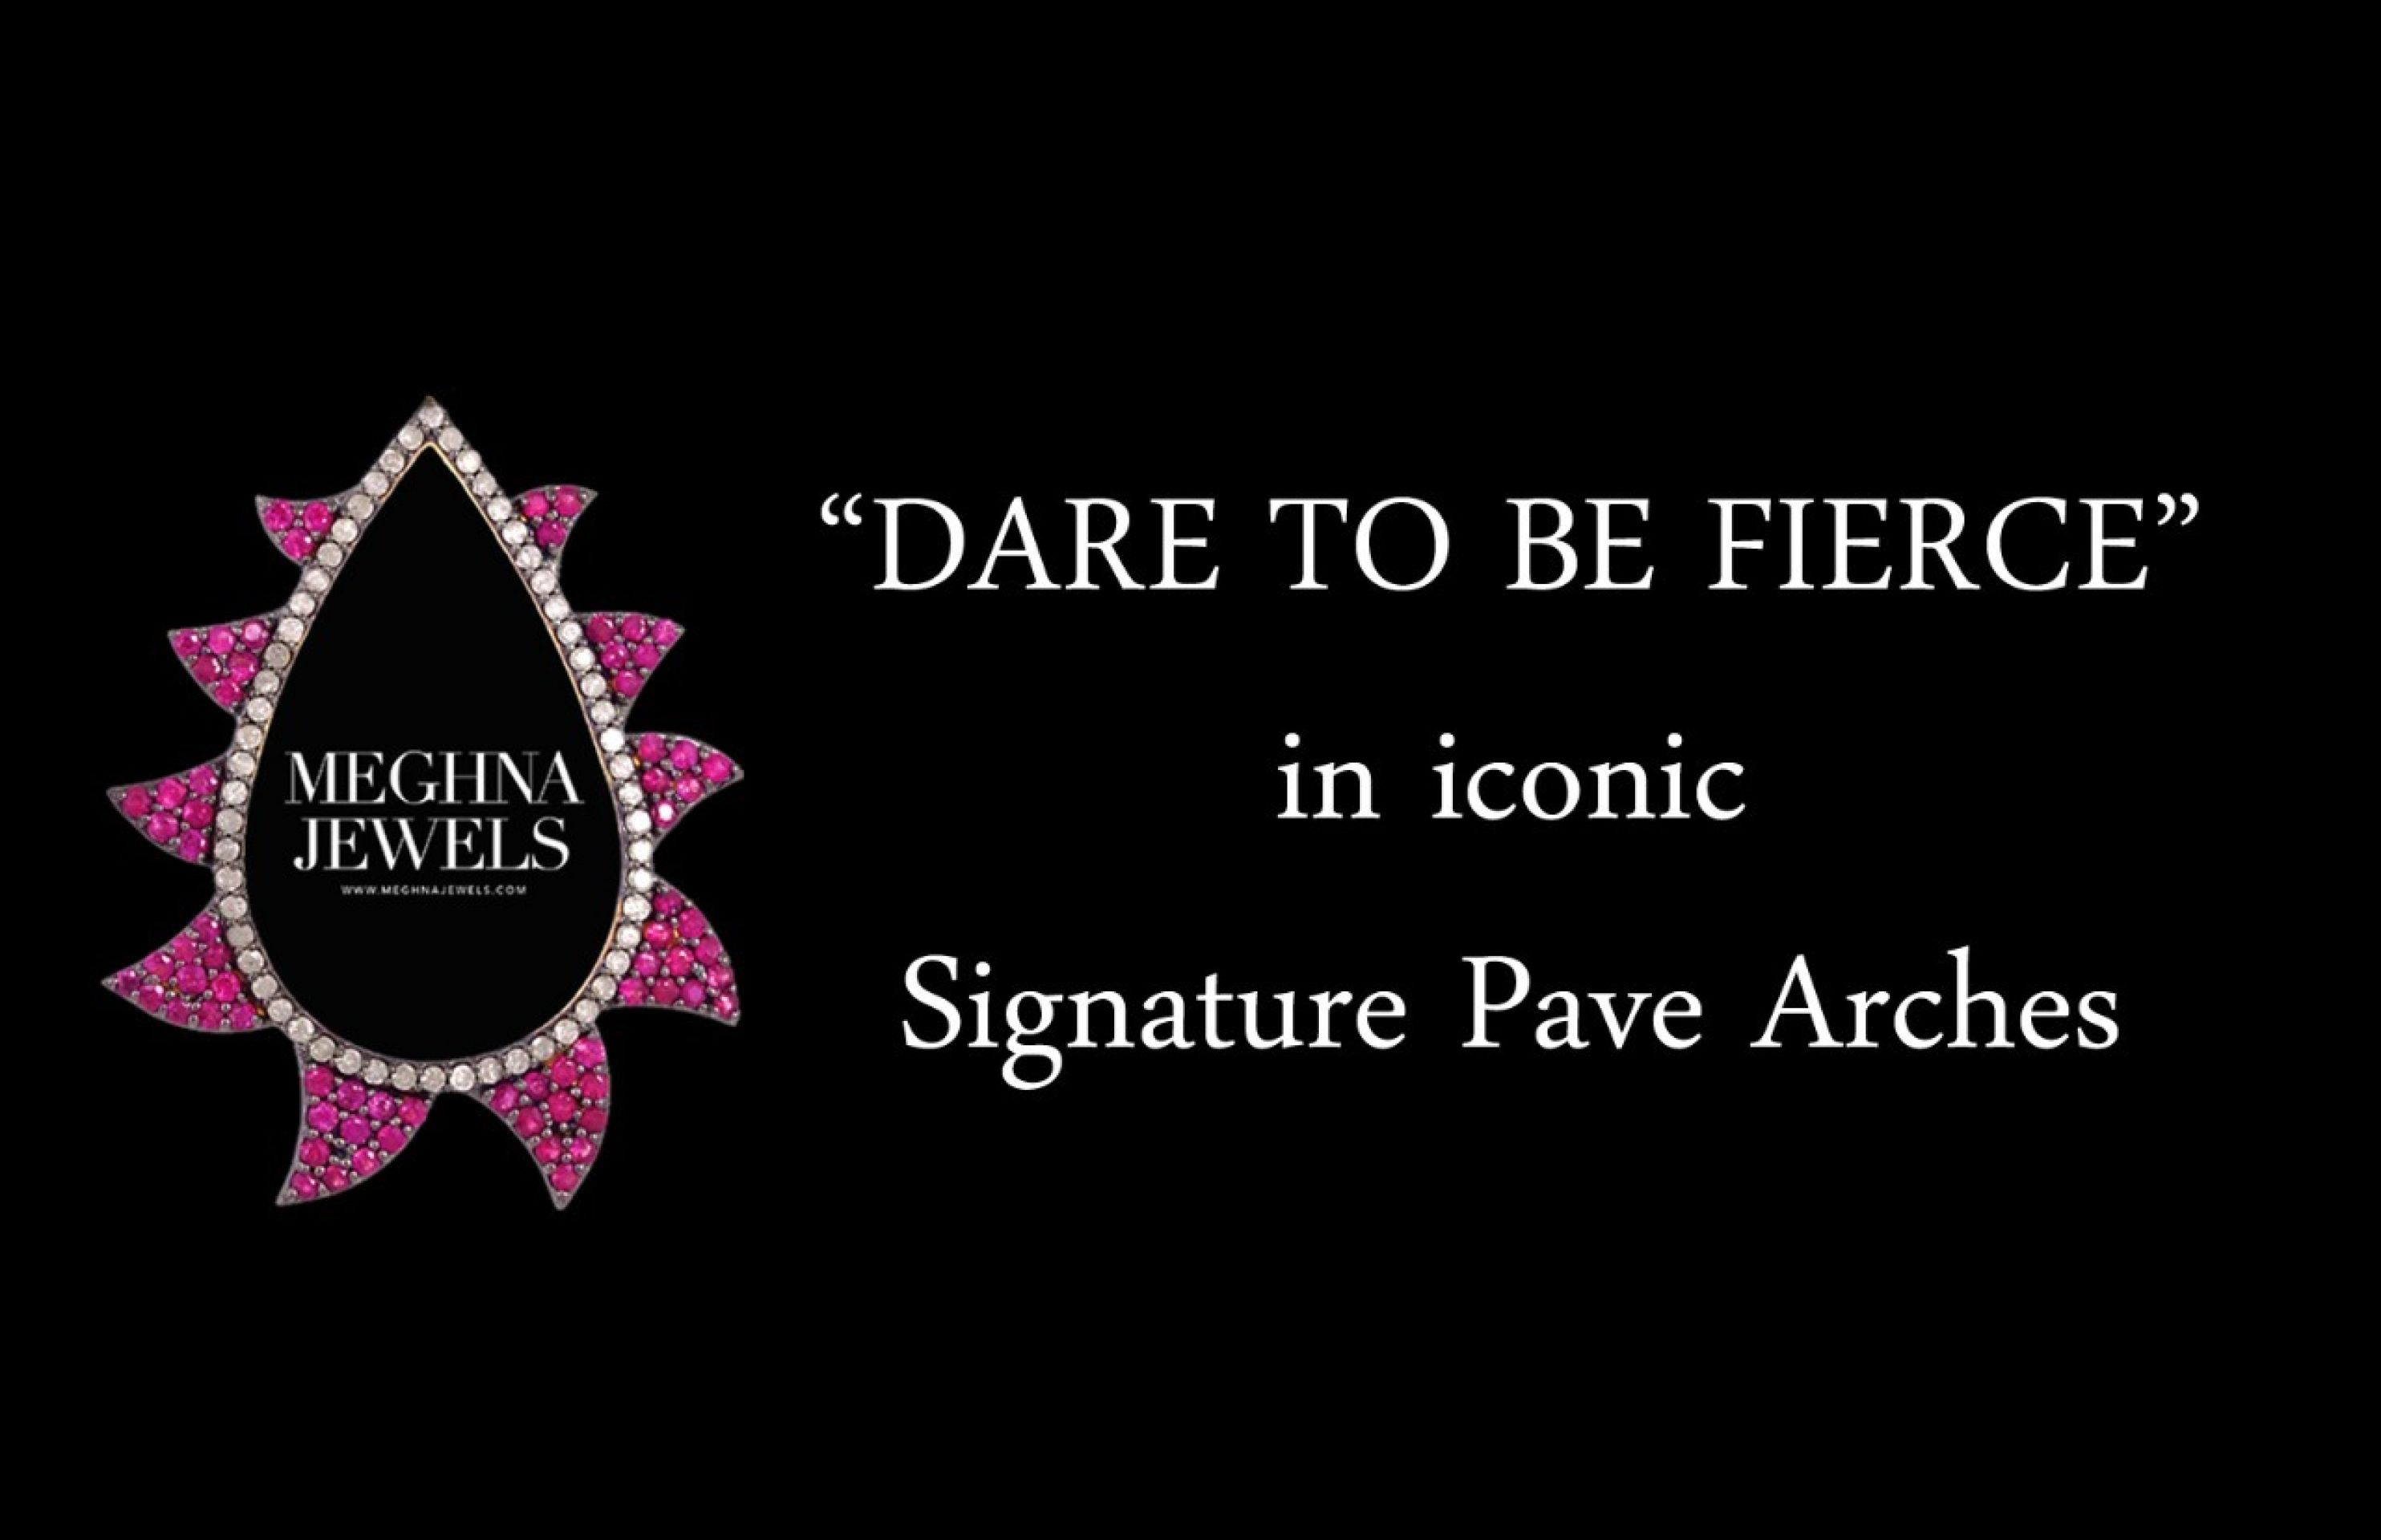 Meghna Jewels Claw Drop Earrings Turquoise & Alt Diamonds